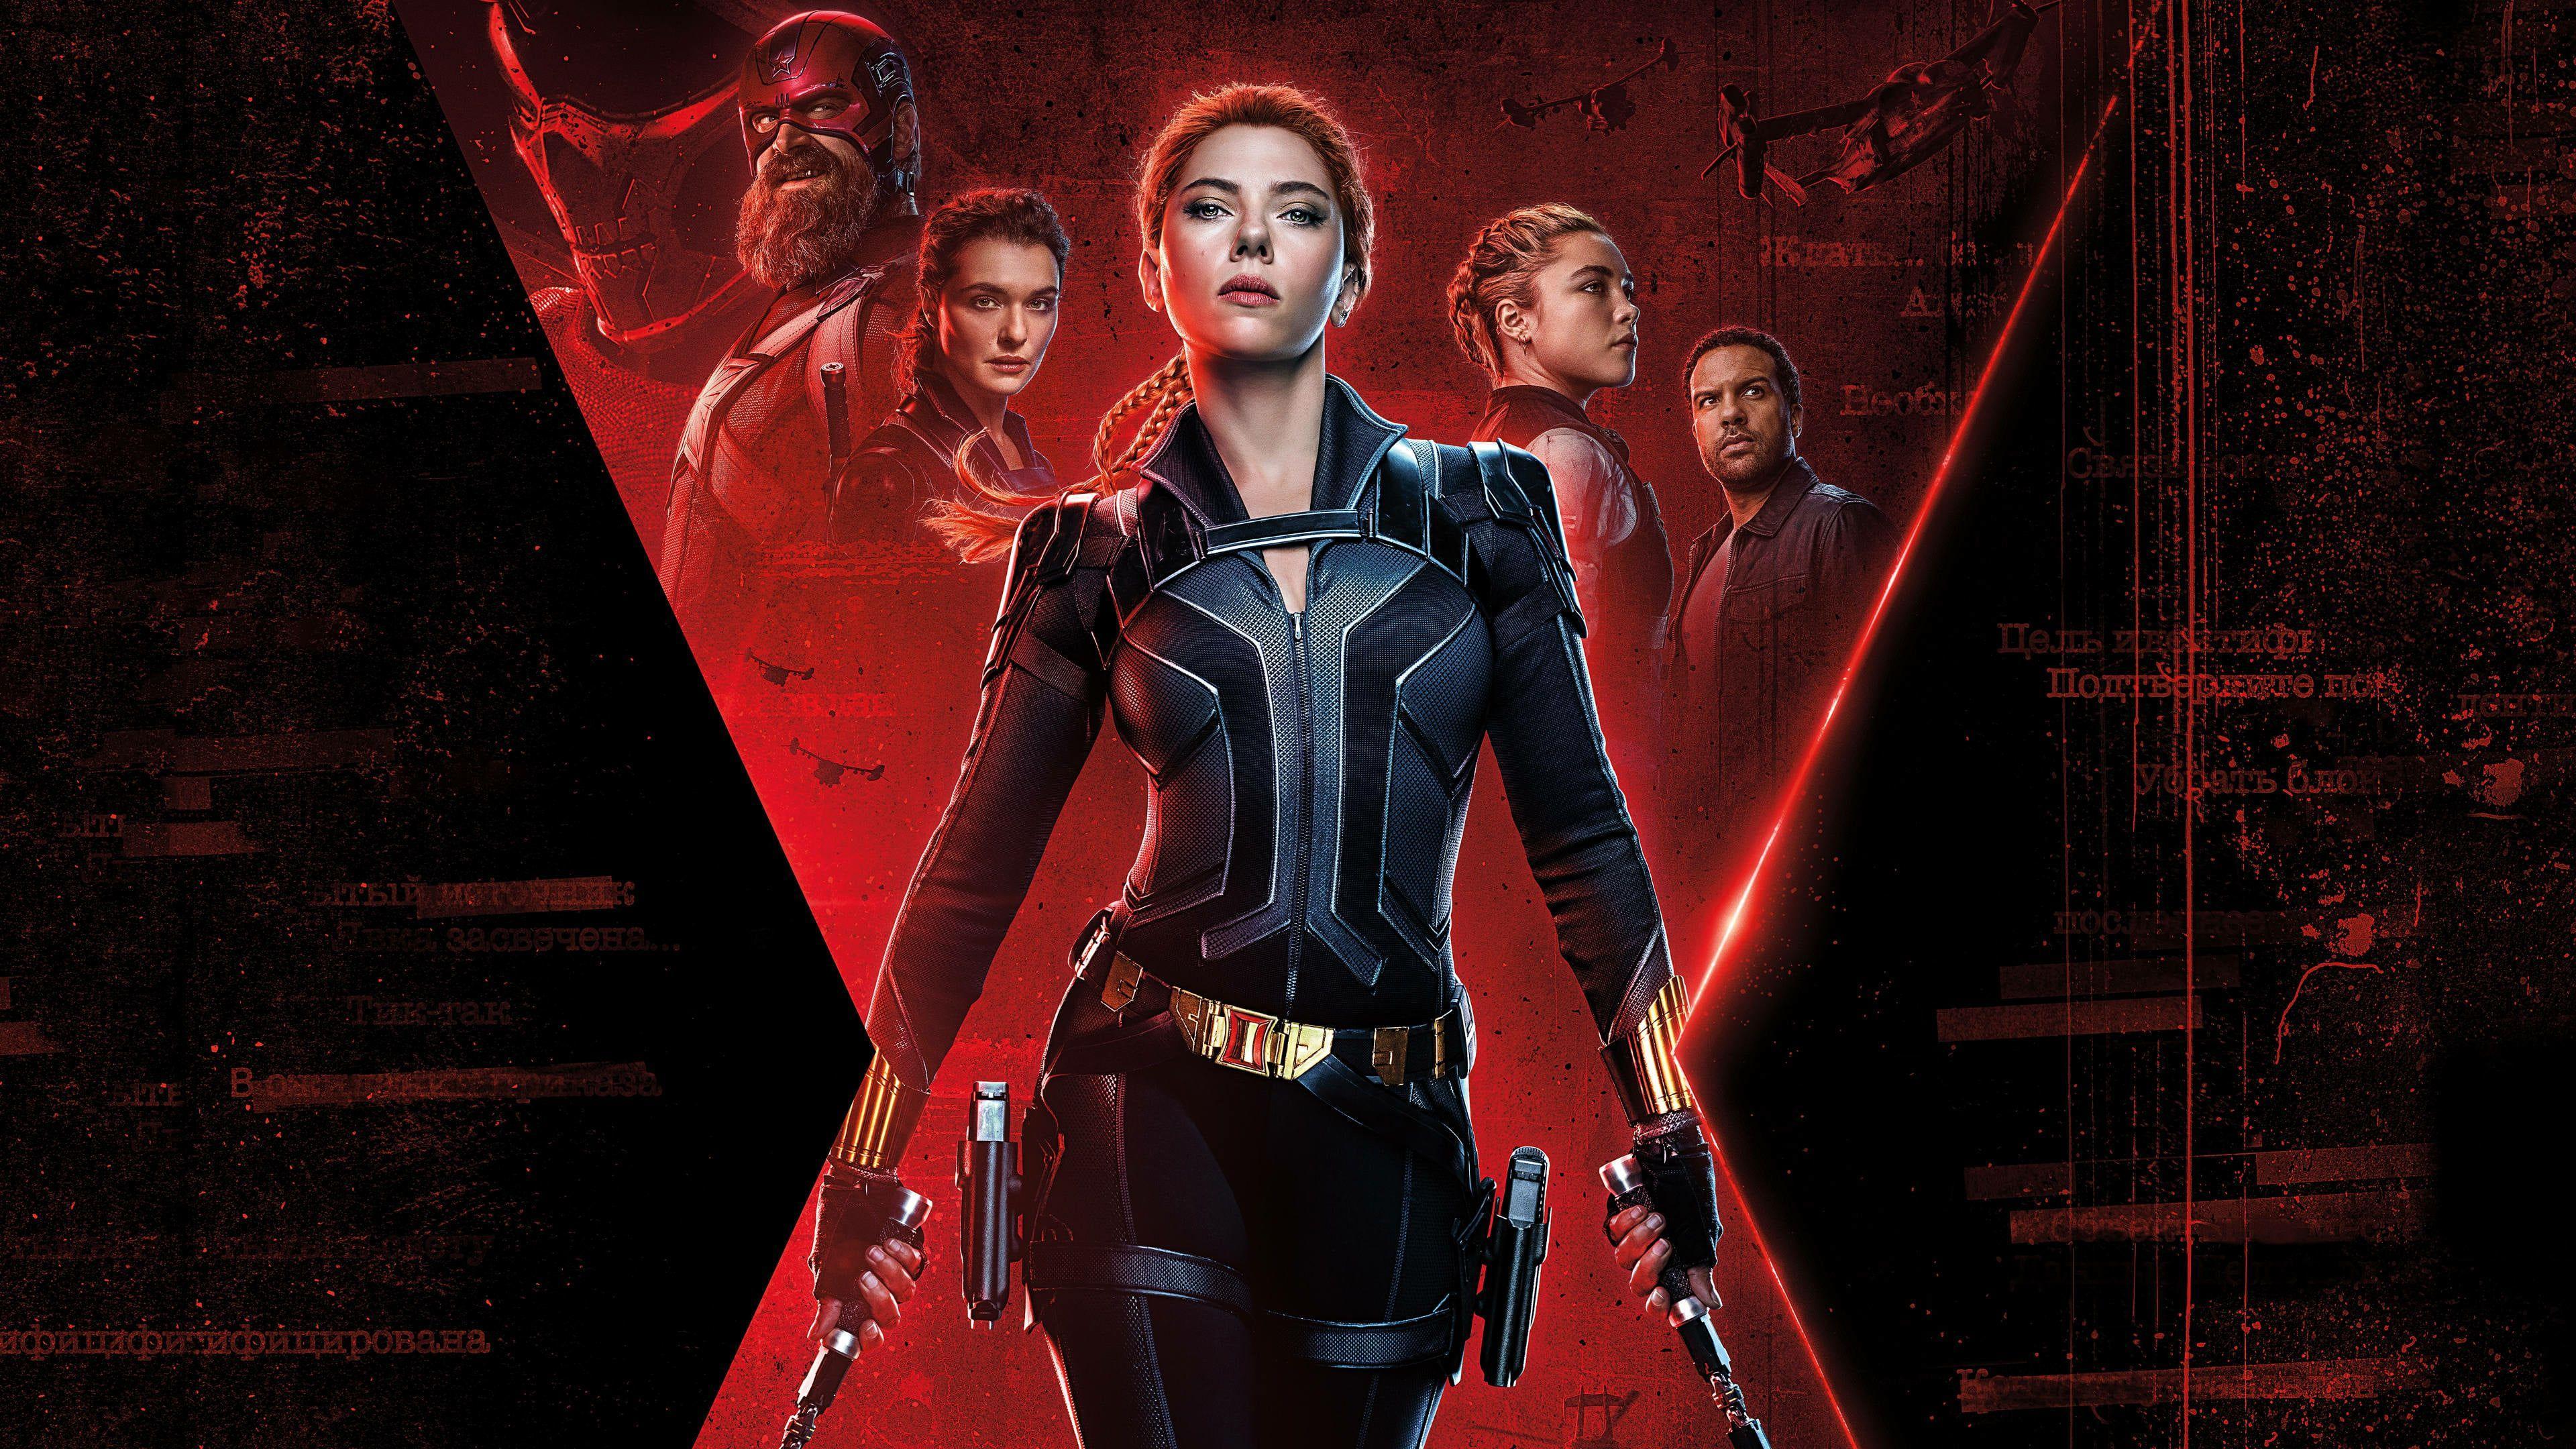 Black Widow Movie Wallpapers - Top Free Black Widow Movie Backgrounds -  WallpaperAccess